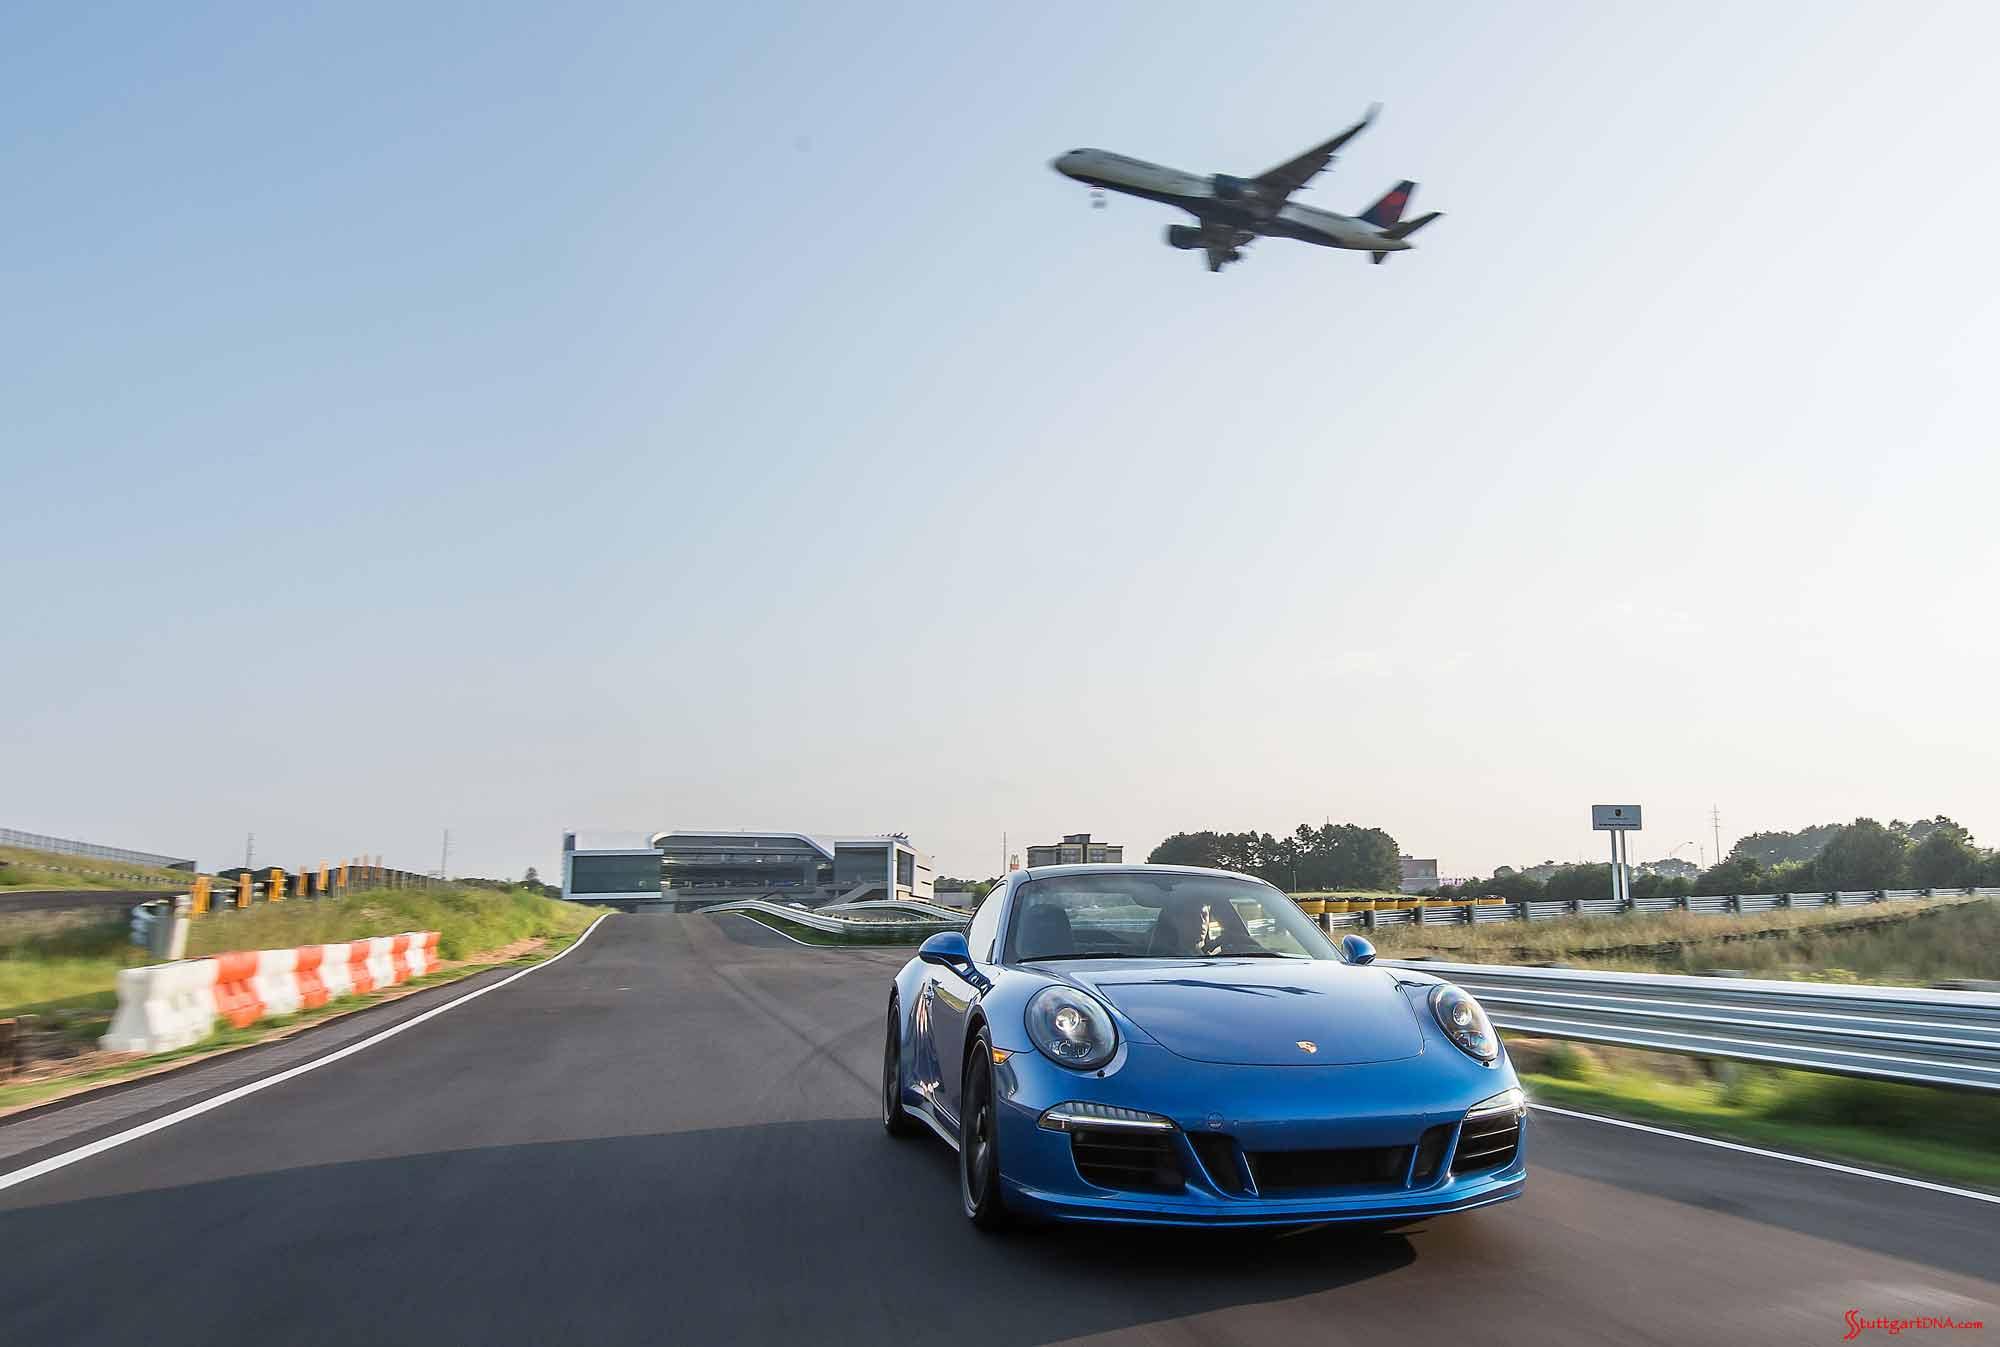 Porsche-EPC-Atlanta-911-on-track-and-airliner-in-bg Mesmerizing Porsche 918 Spyder London Ontario Cars Trend